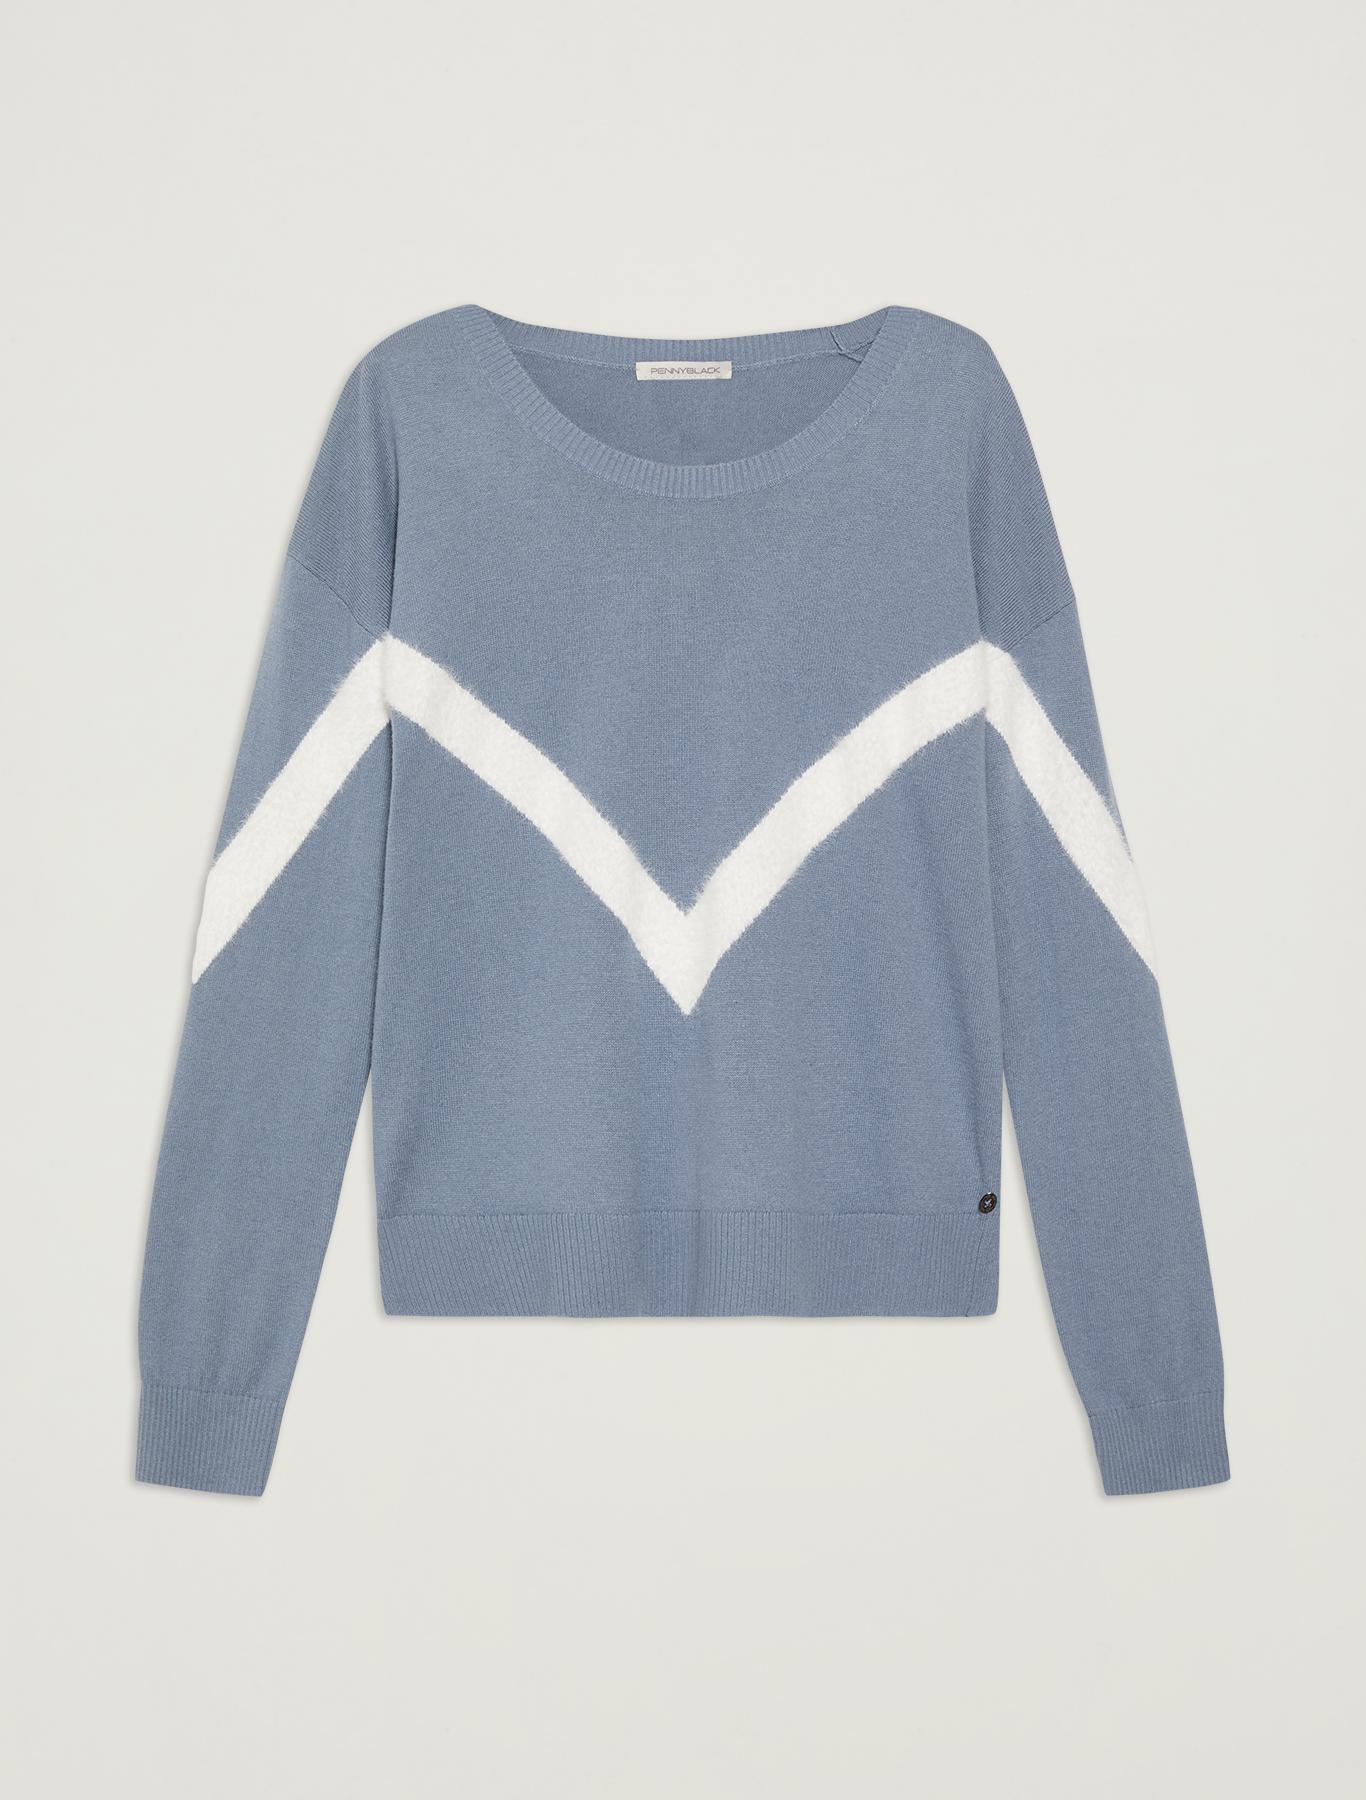 Sweater with geometric inlay - light blue - pennyblack